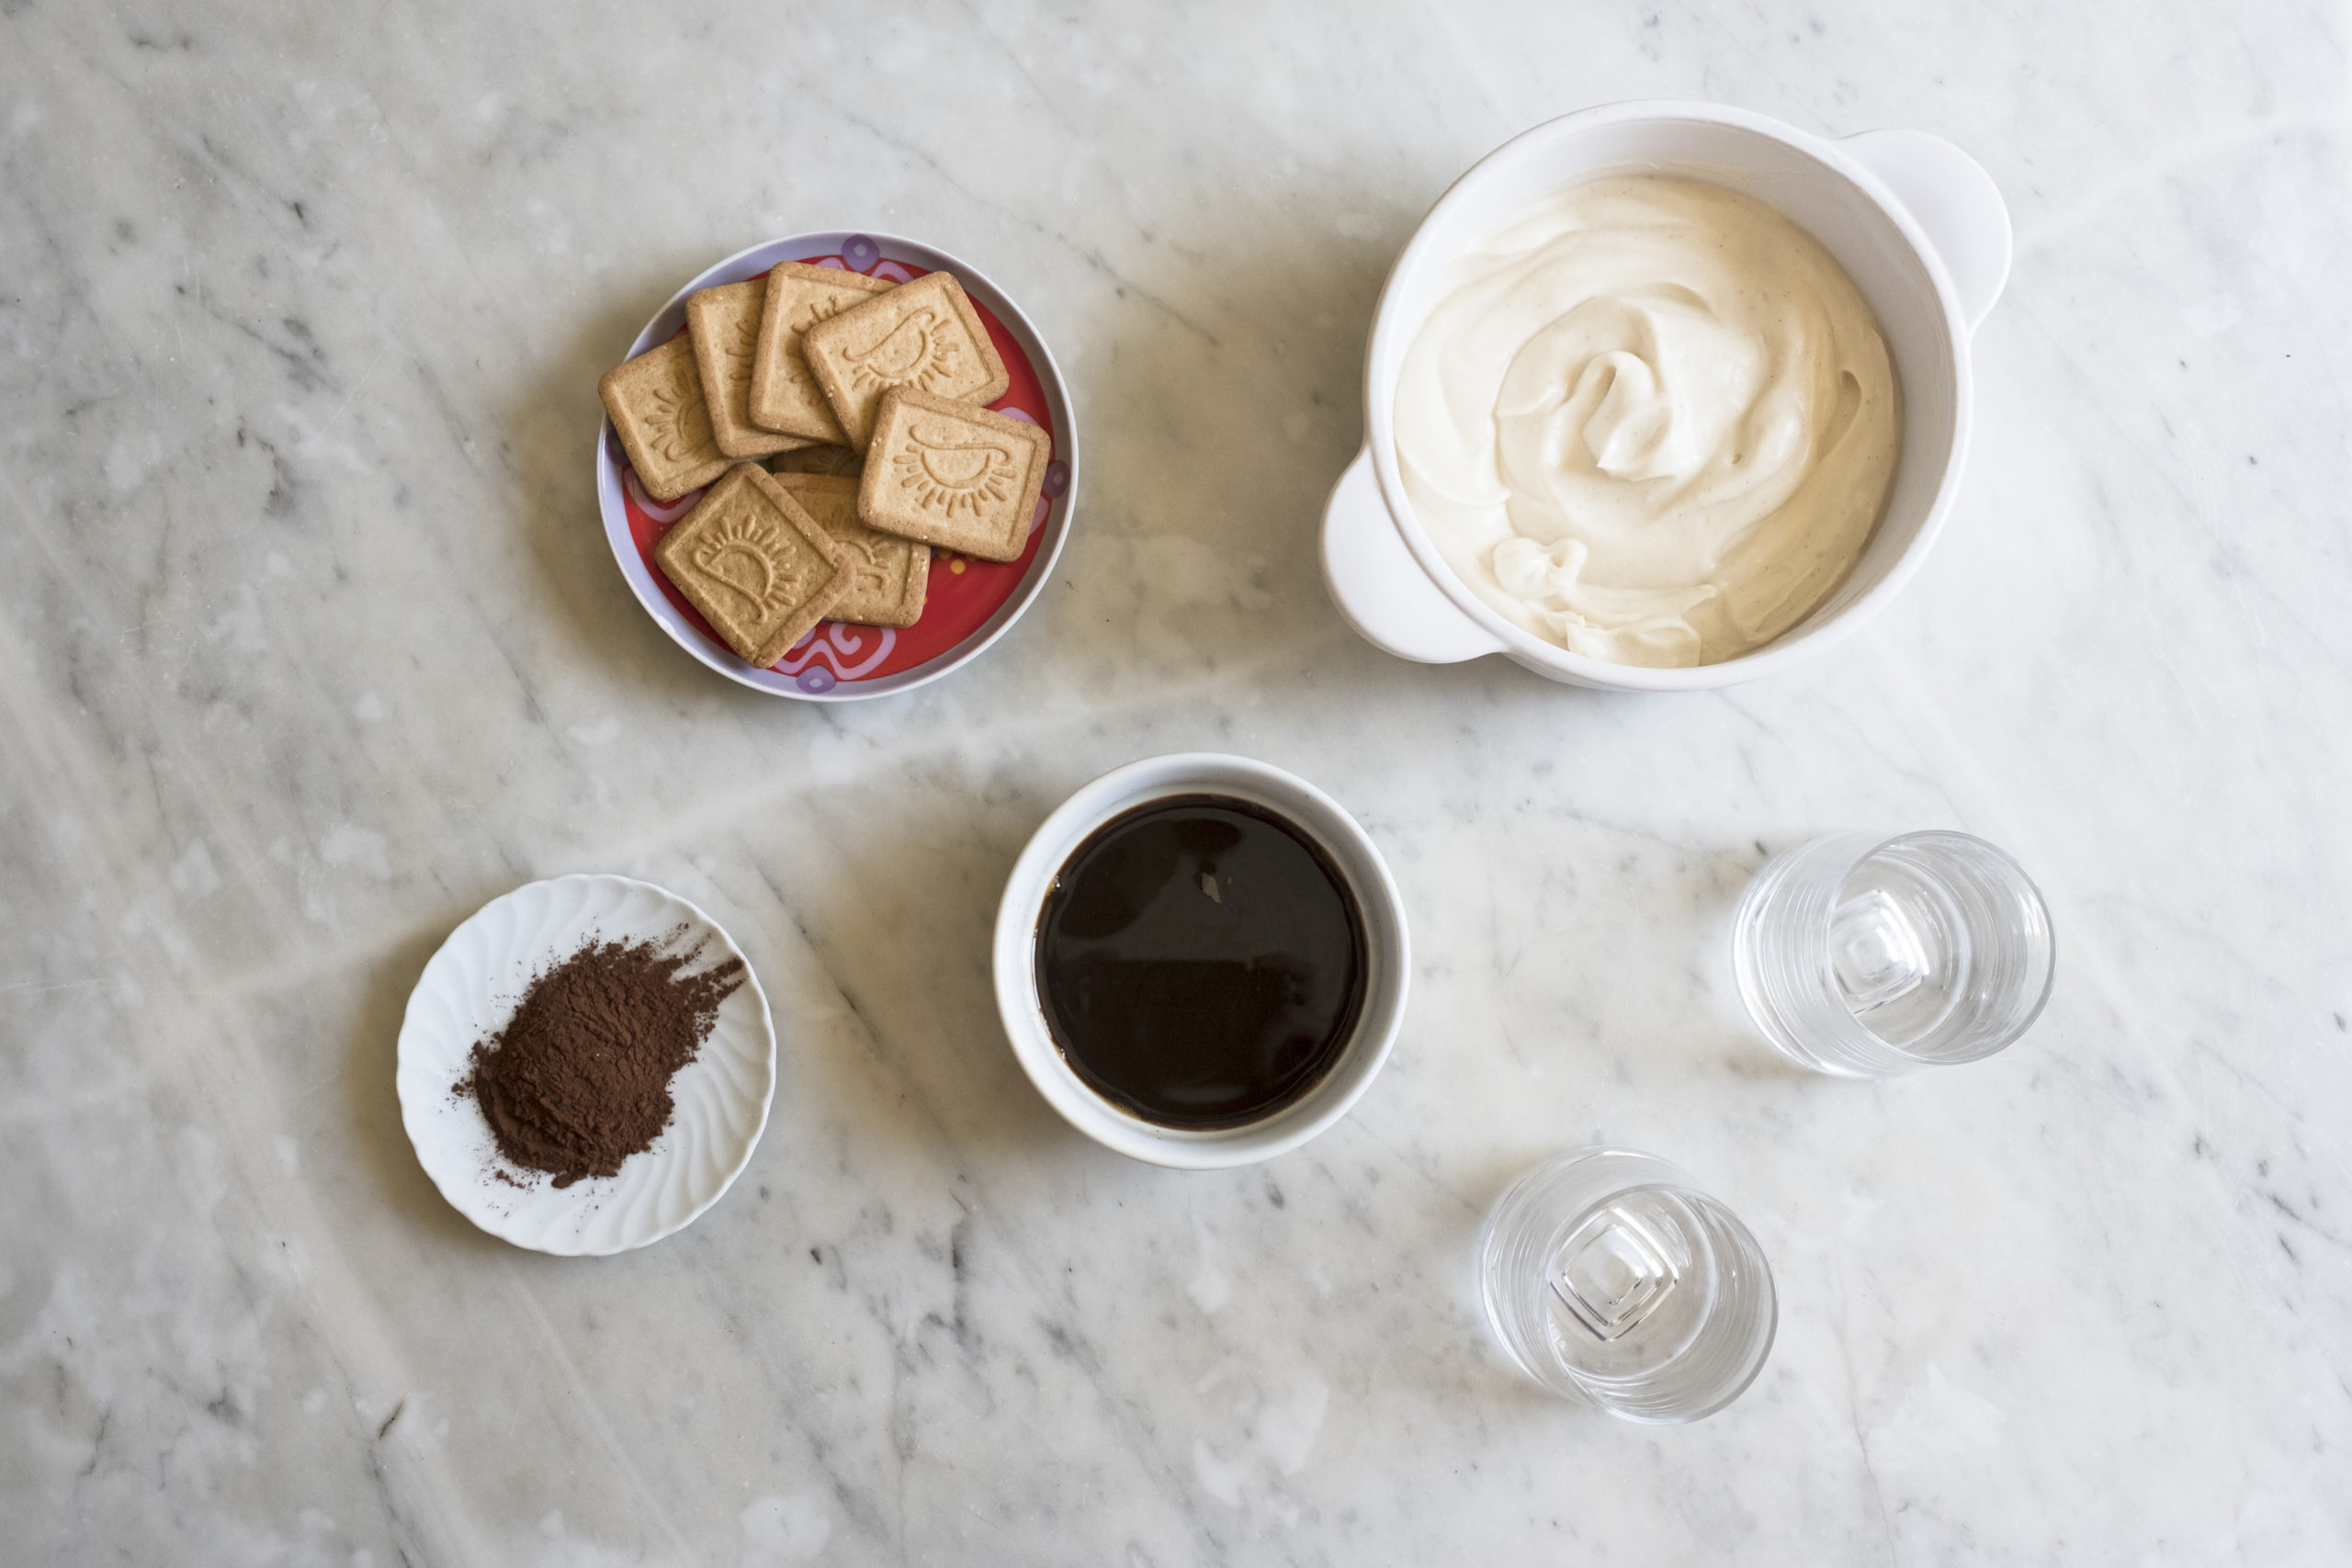 Coffee, biscuits, cocoa, vegan mascarpone